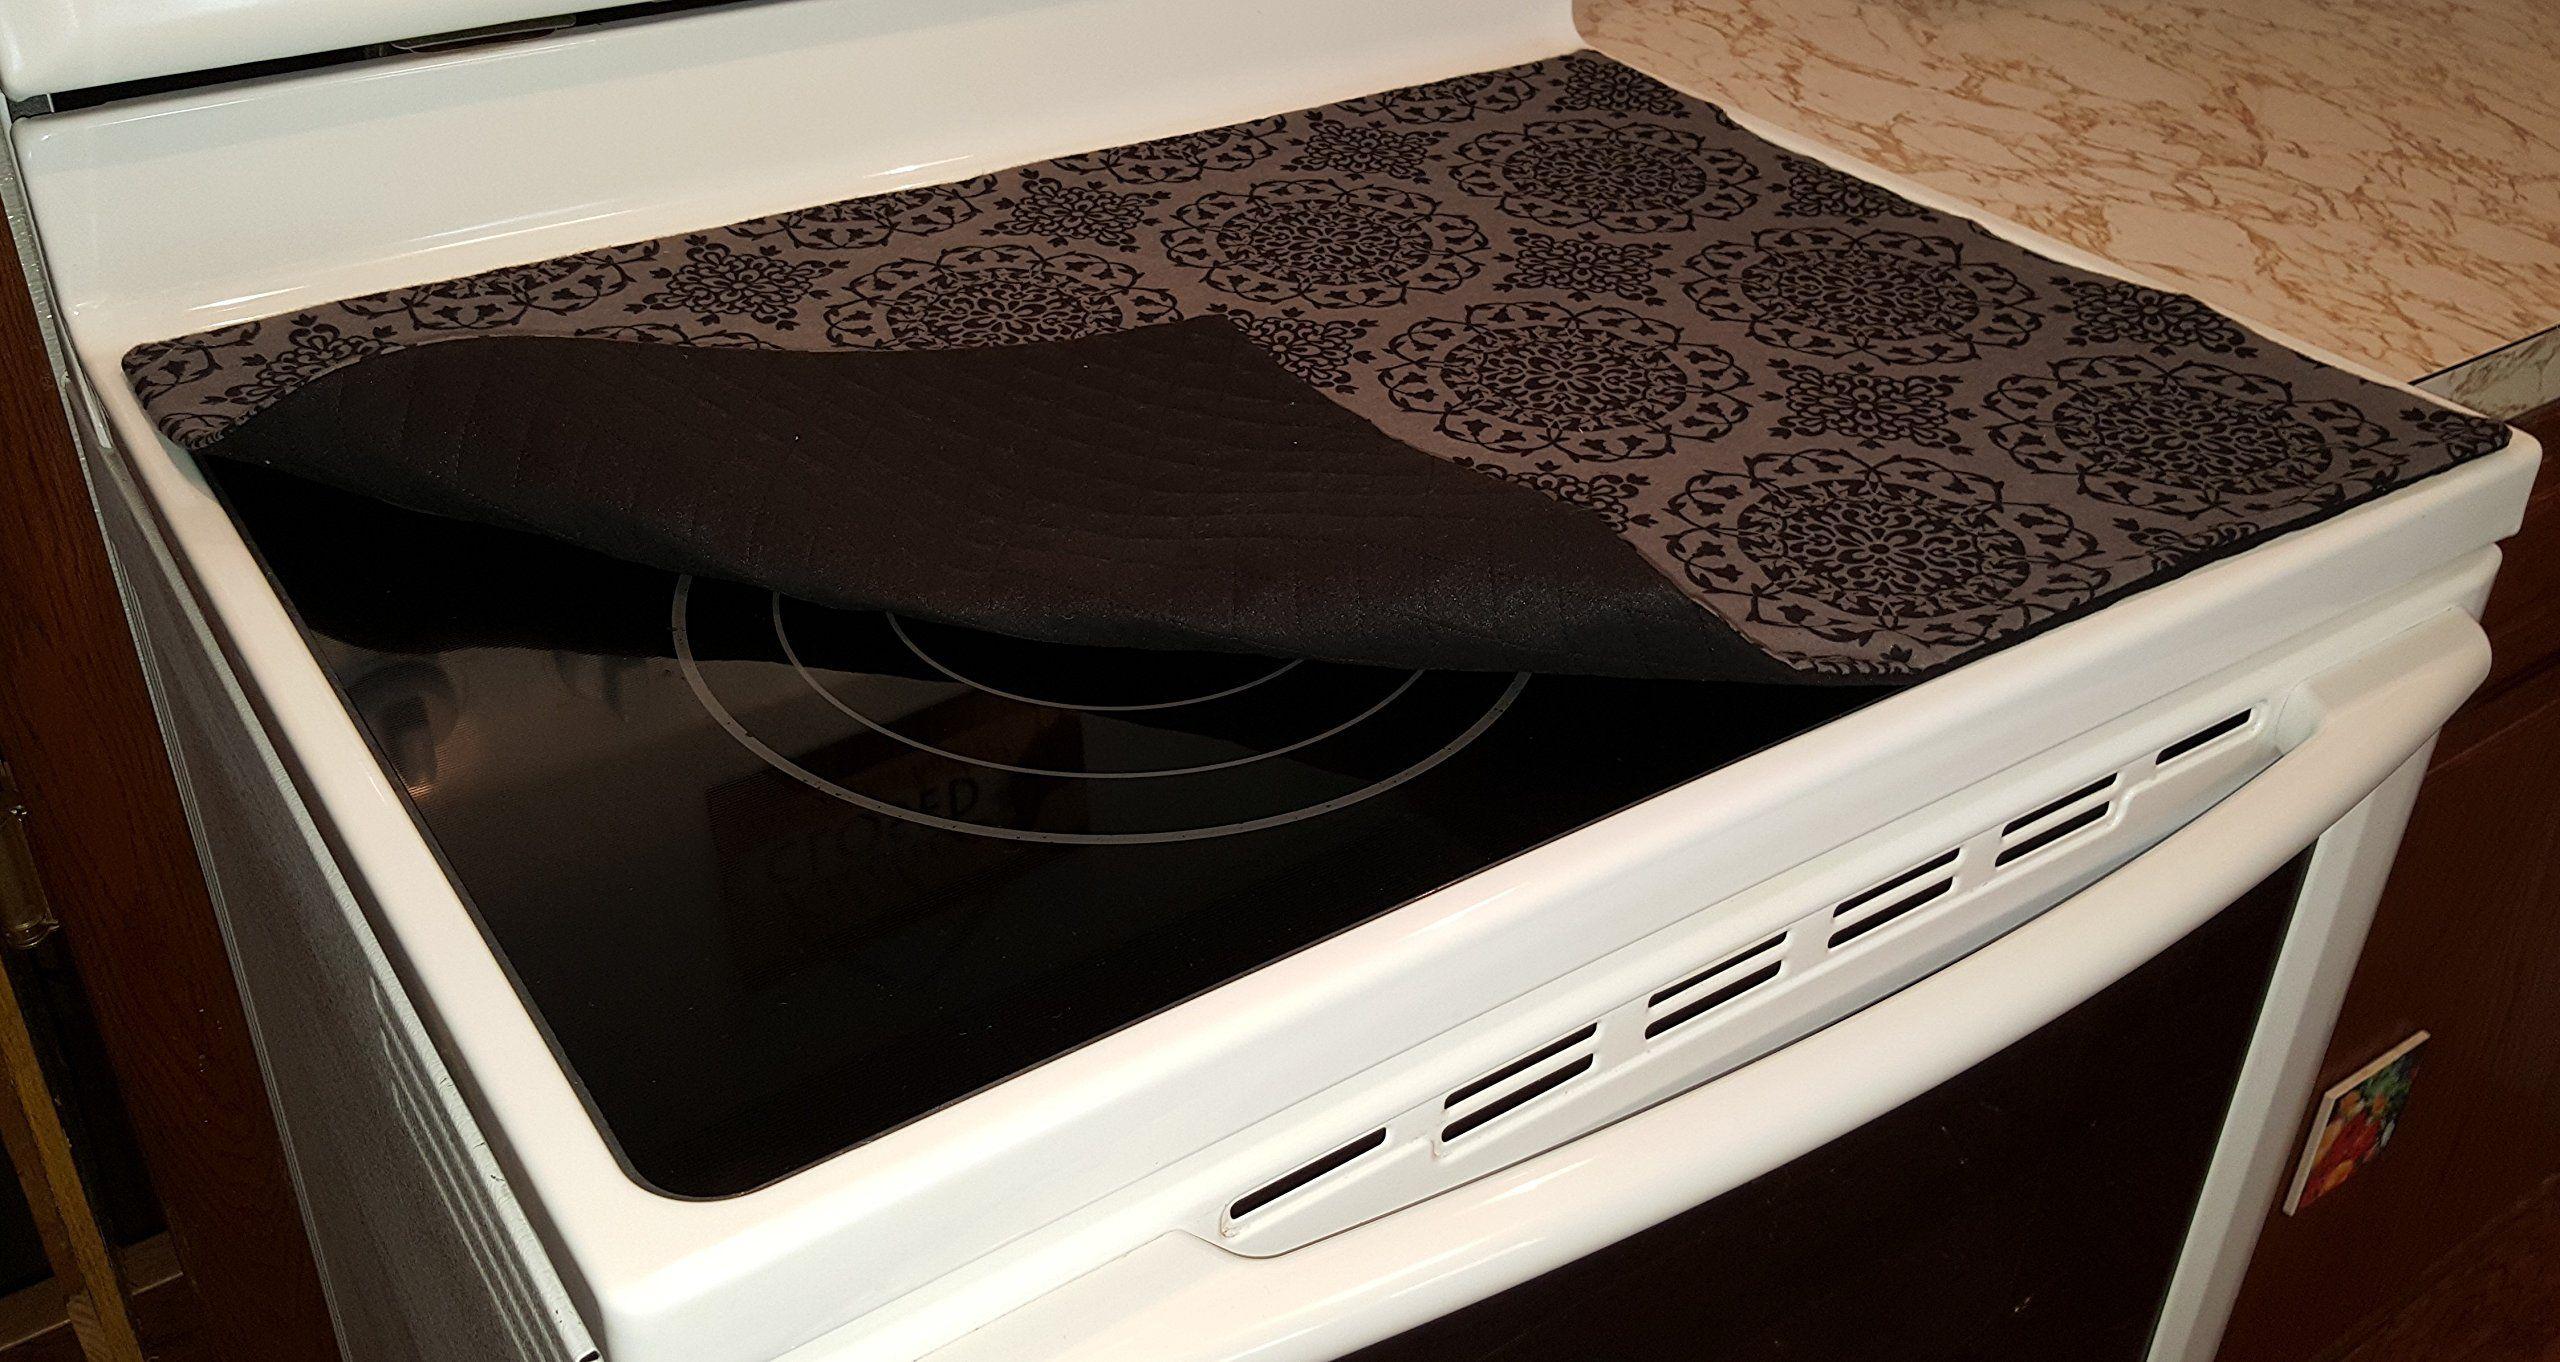 Gray black medallion damask glass stove top cook top